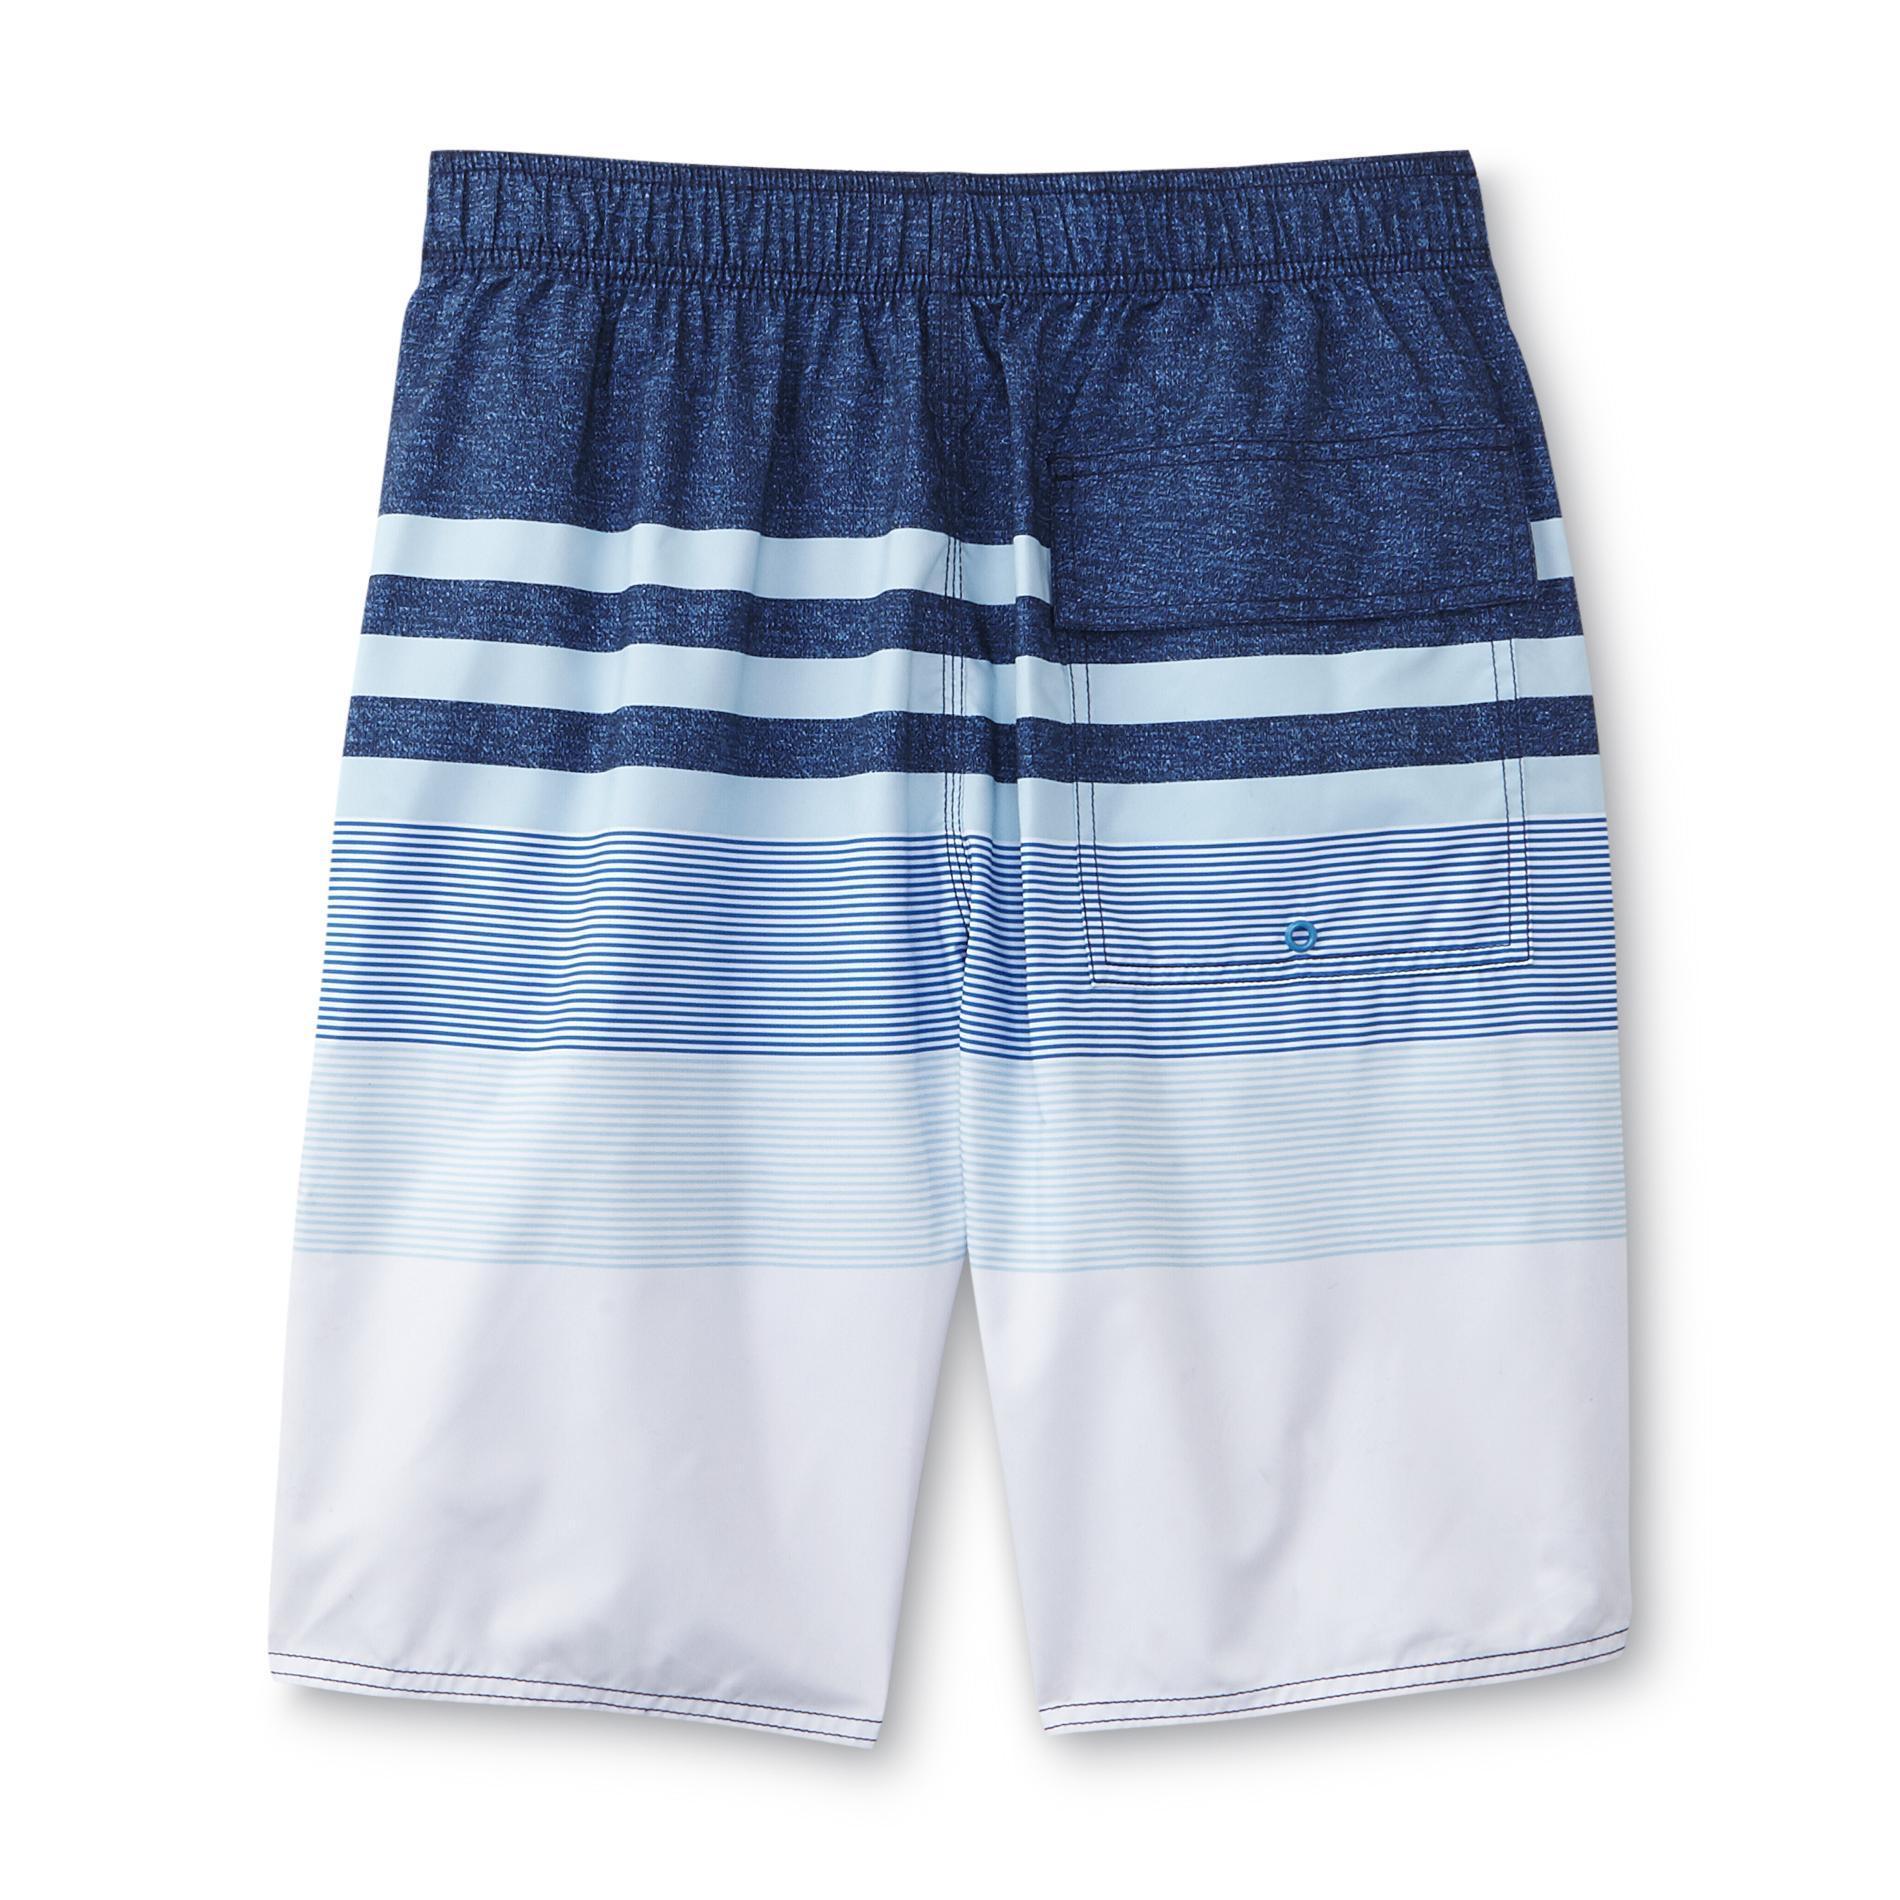 Joe Boxer Young Men's Boardshorts - Striped